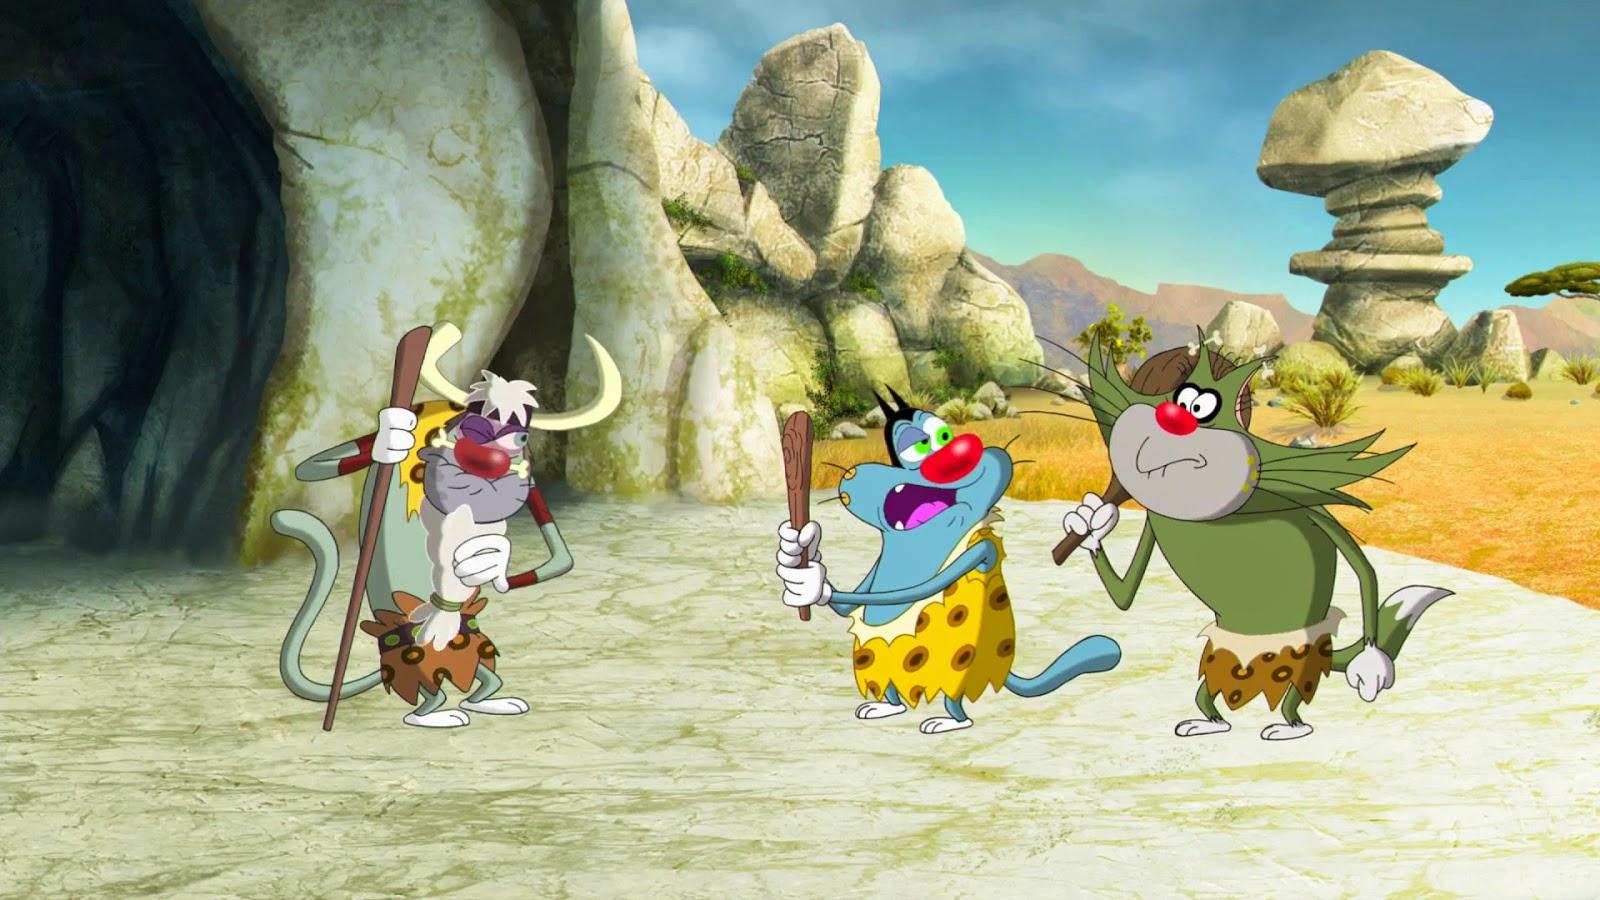 Hd Cartoon Movie In Hindi Download